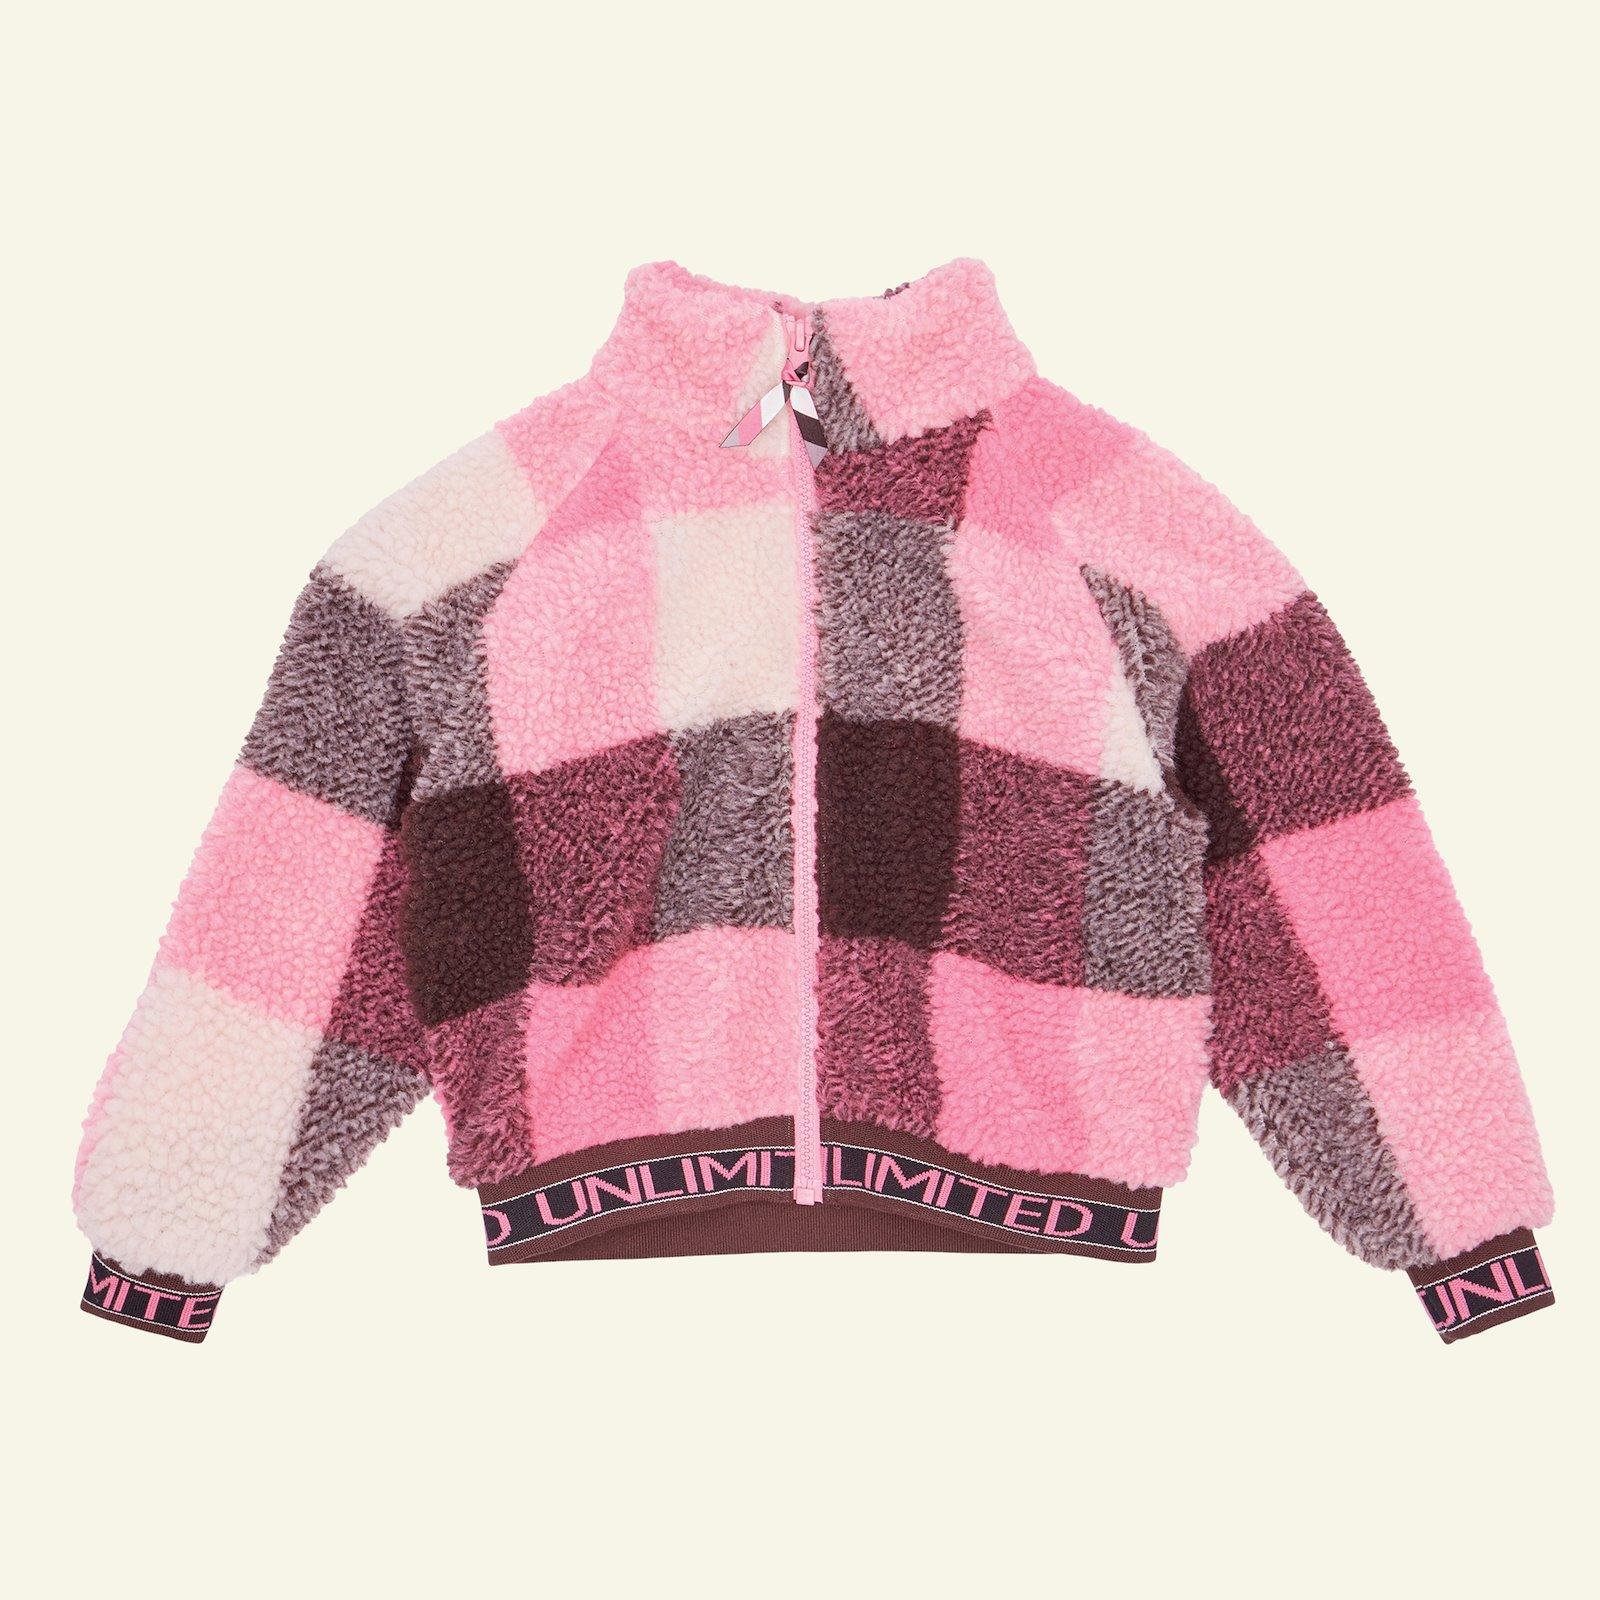 Anorak and jacket, 122/7y p64020_910277_96184_sskit